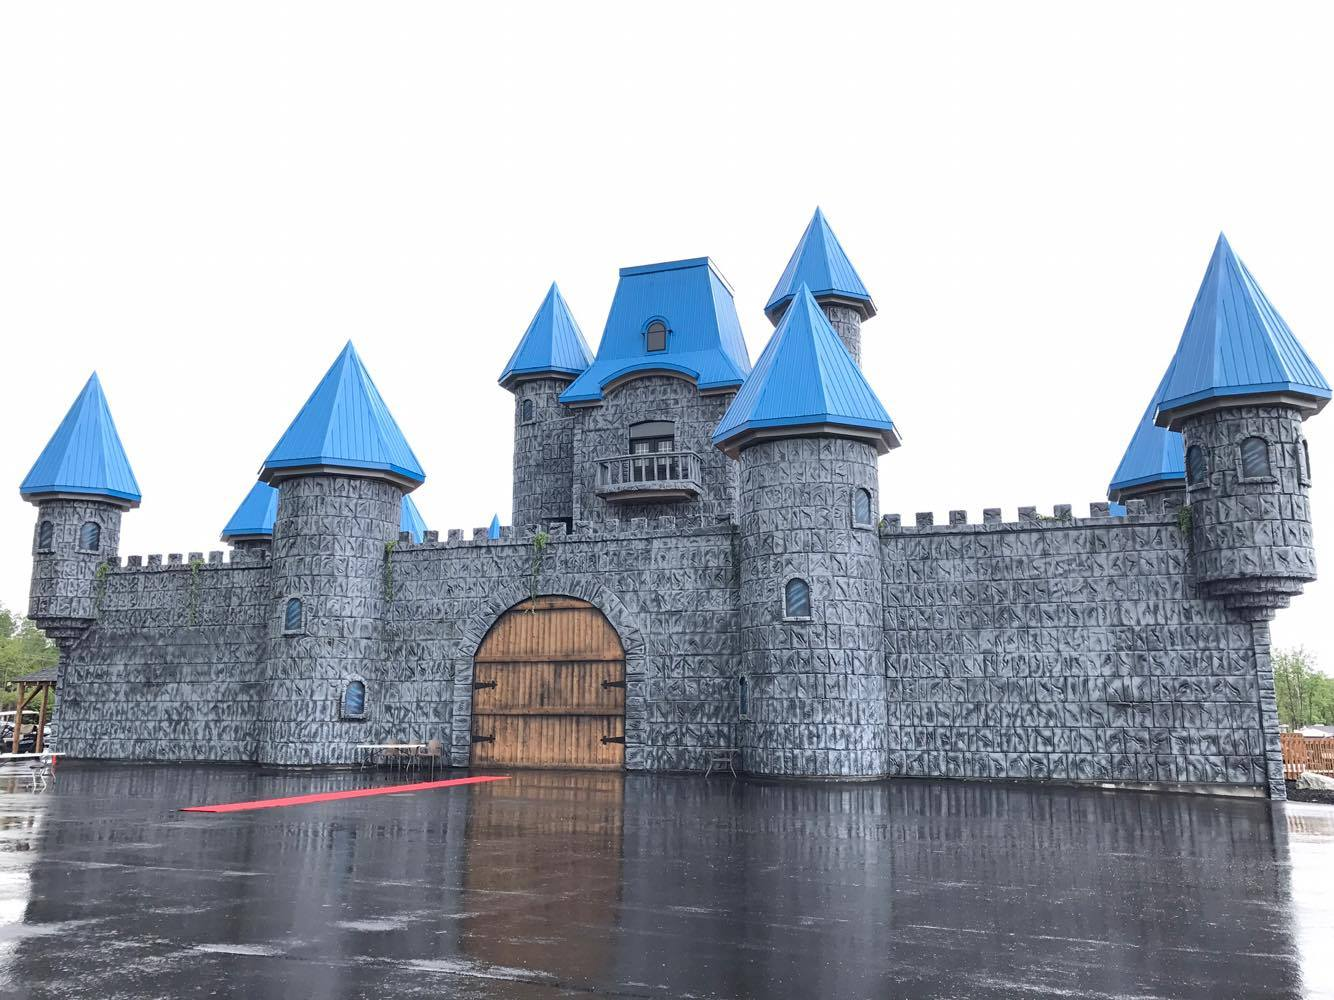 http://www.campingatlantide.com/wp-content/uploads/2017/06/chateau-magique-complexe-atlantide-2.jpg